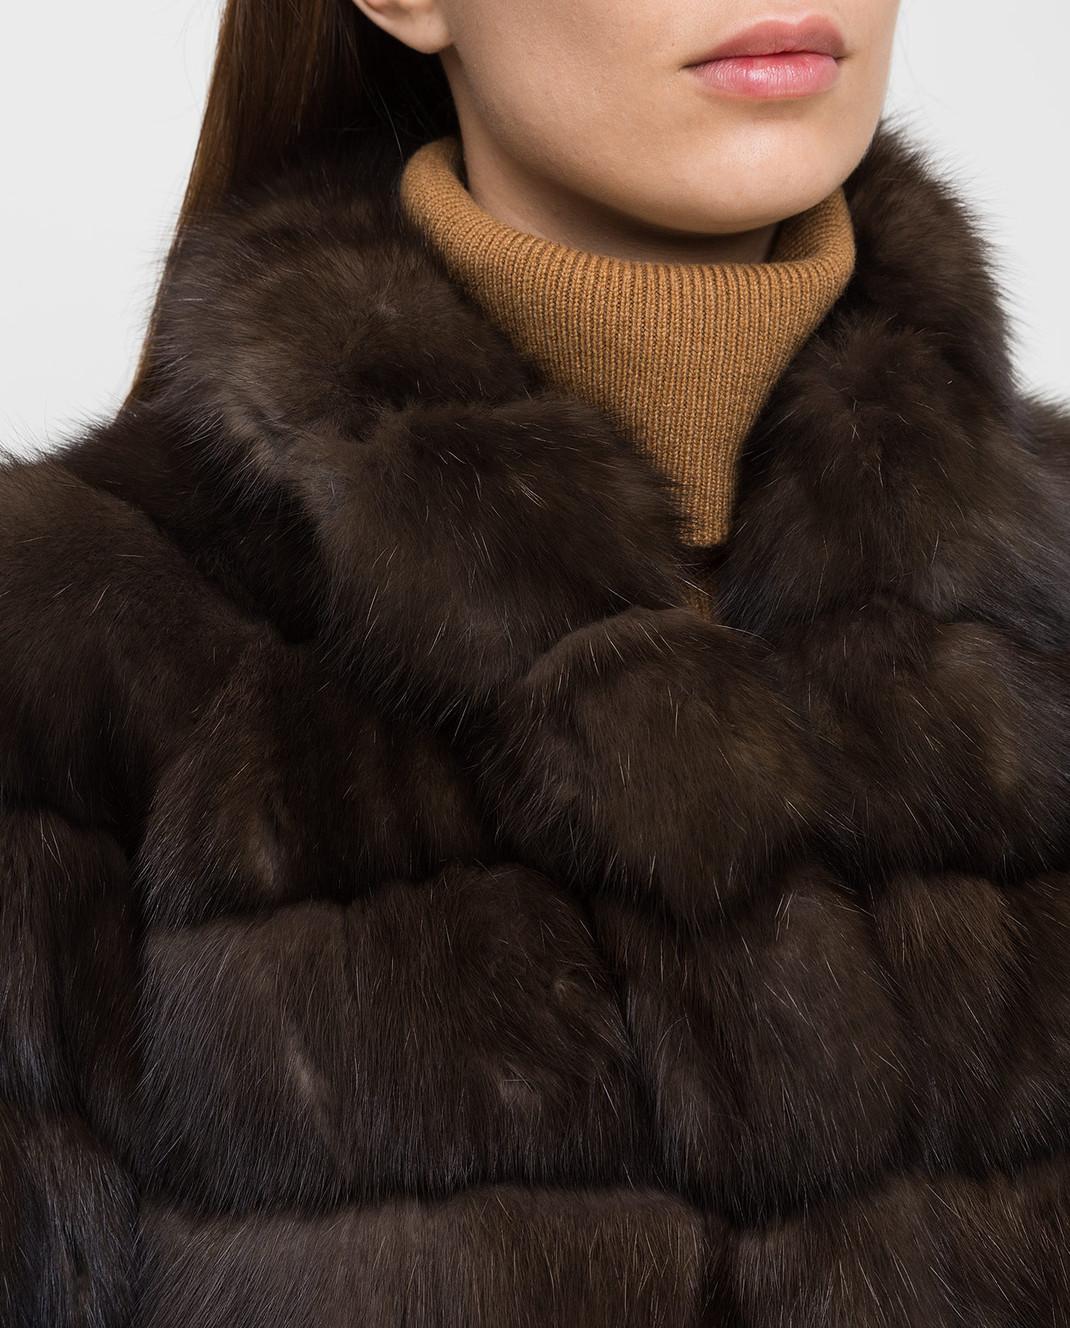 Real Furs House Темно-коричневая шуба из соболя 24342SILVERY изображение 5